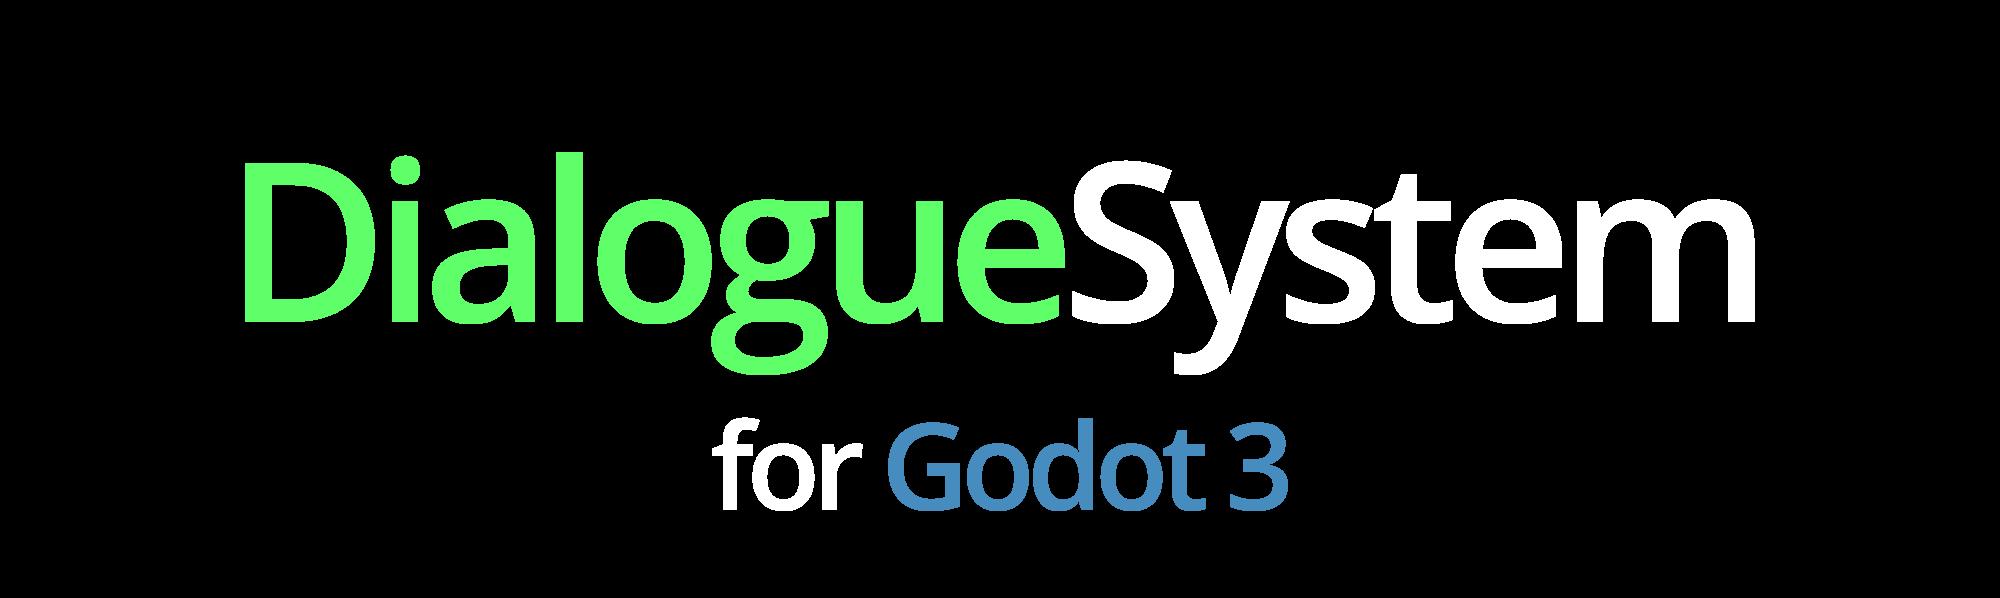 Godot 3 Dialogue System